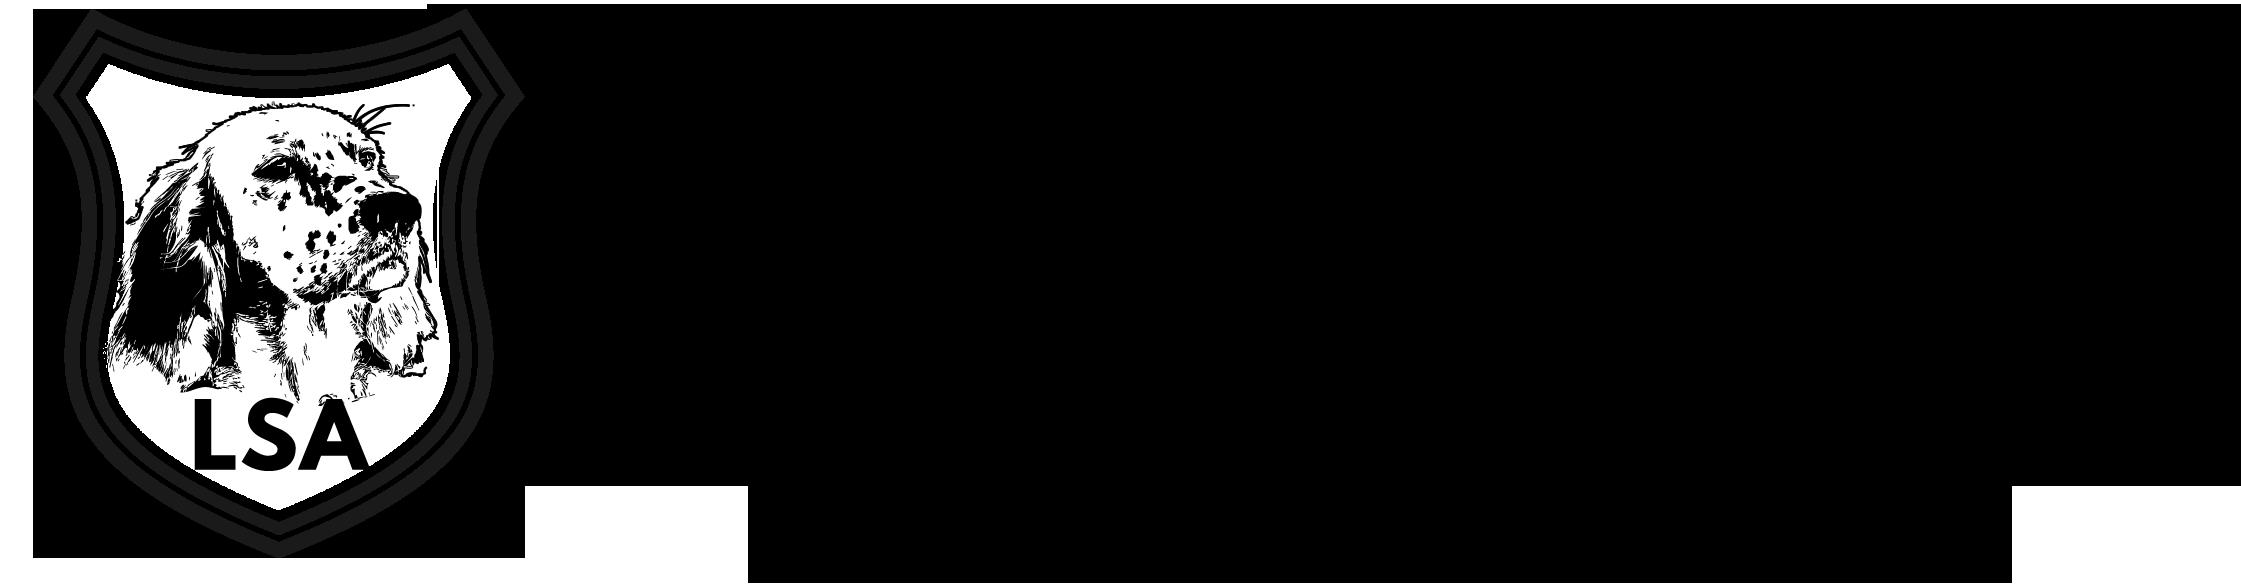 lsa-site-header